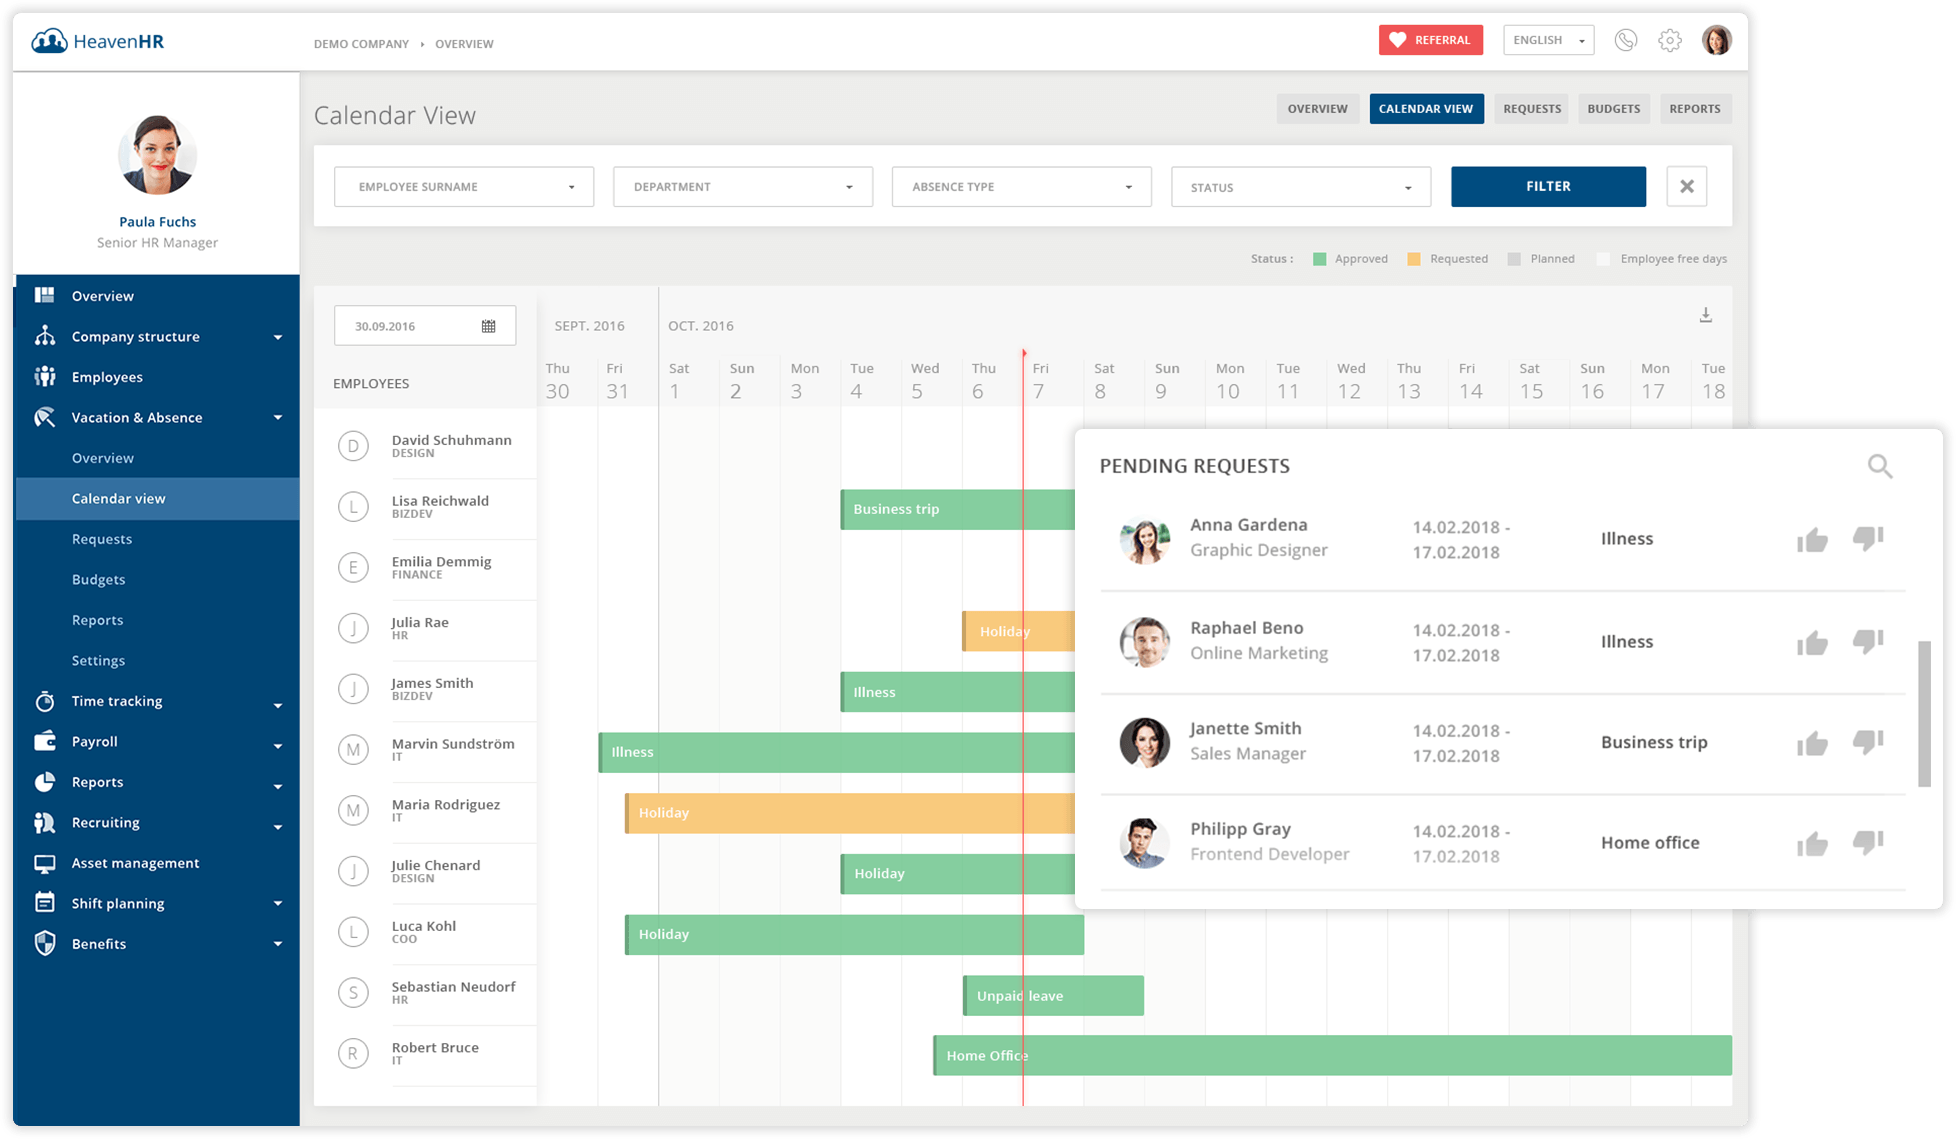 shiftplanning employee login